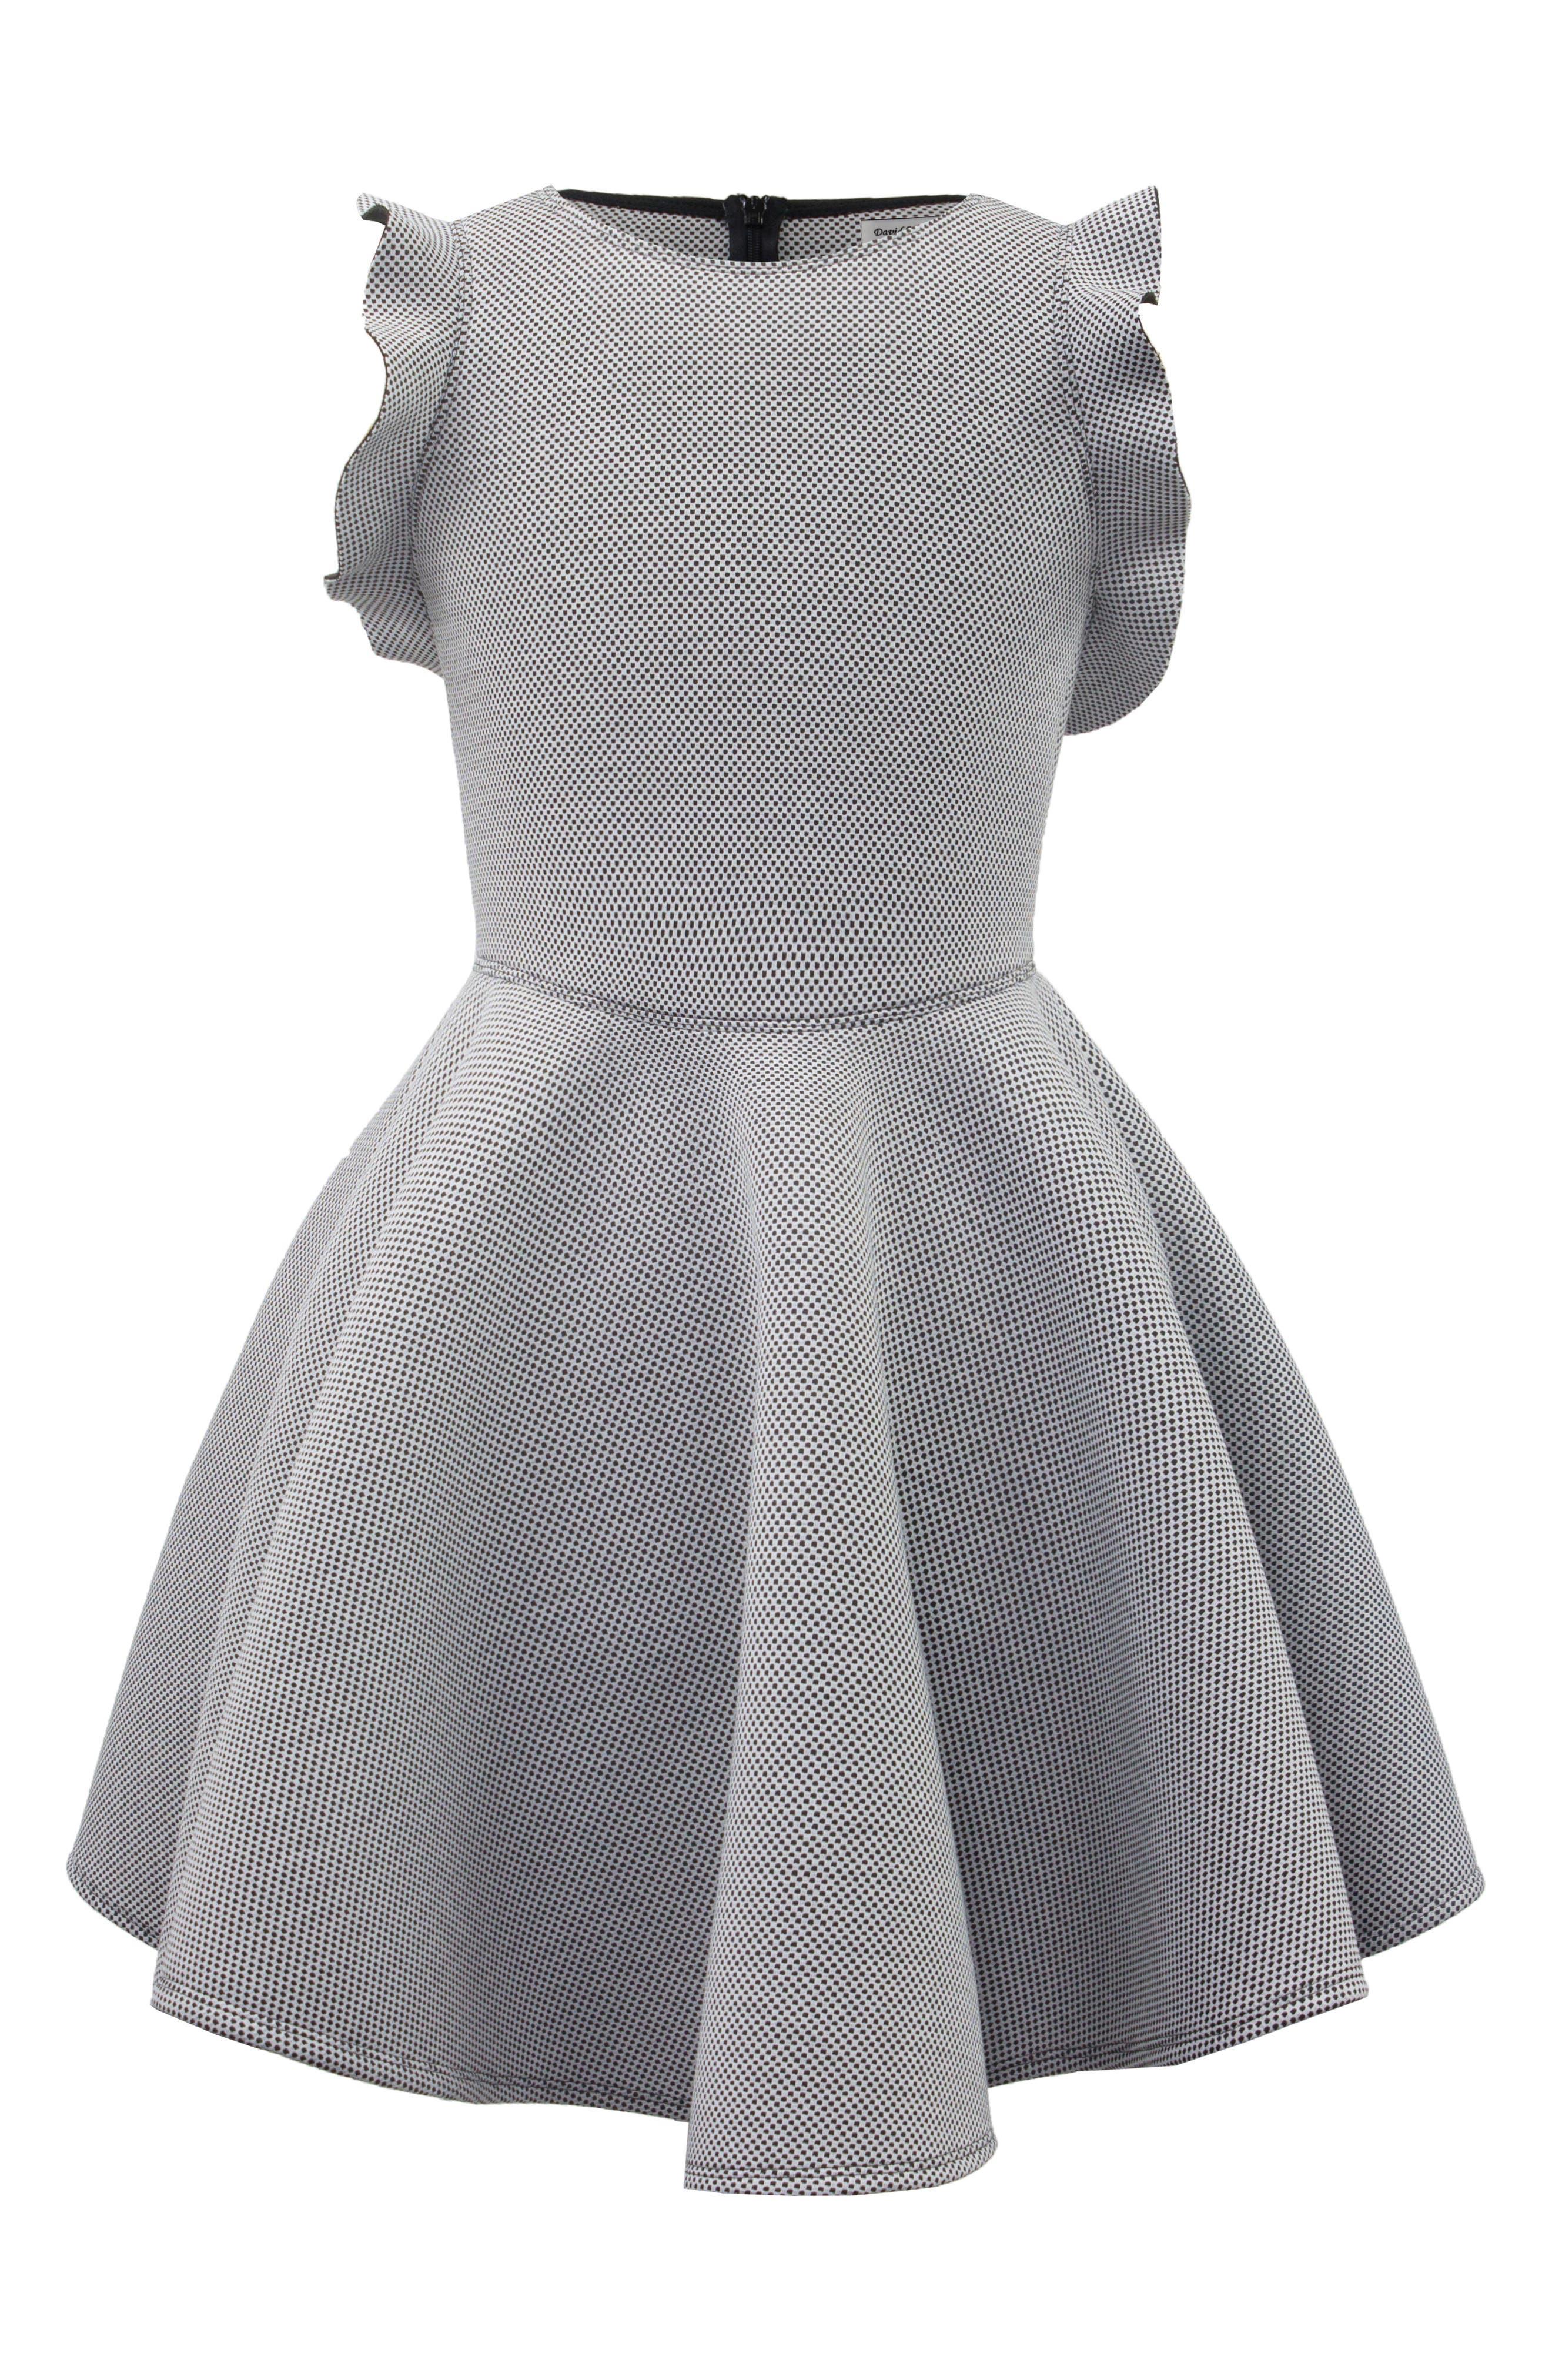 Birdseye Scuba Skater Dress,                             Main thumbnail 1, color,                             001